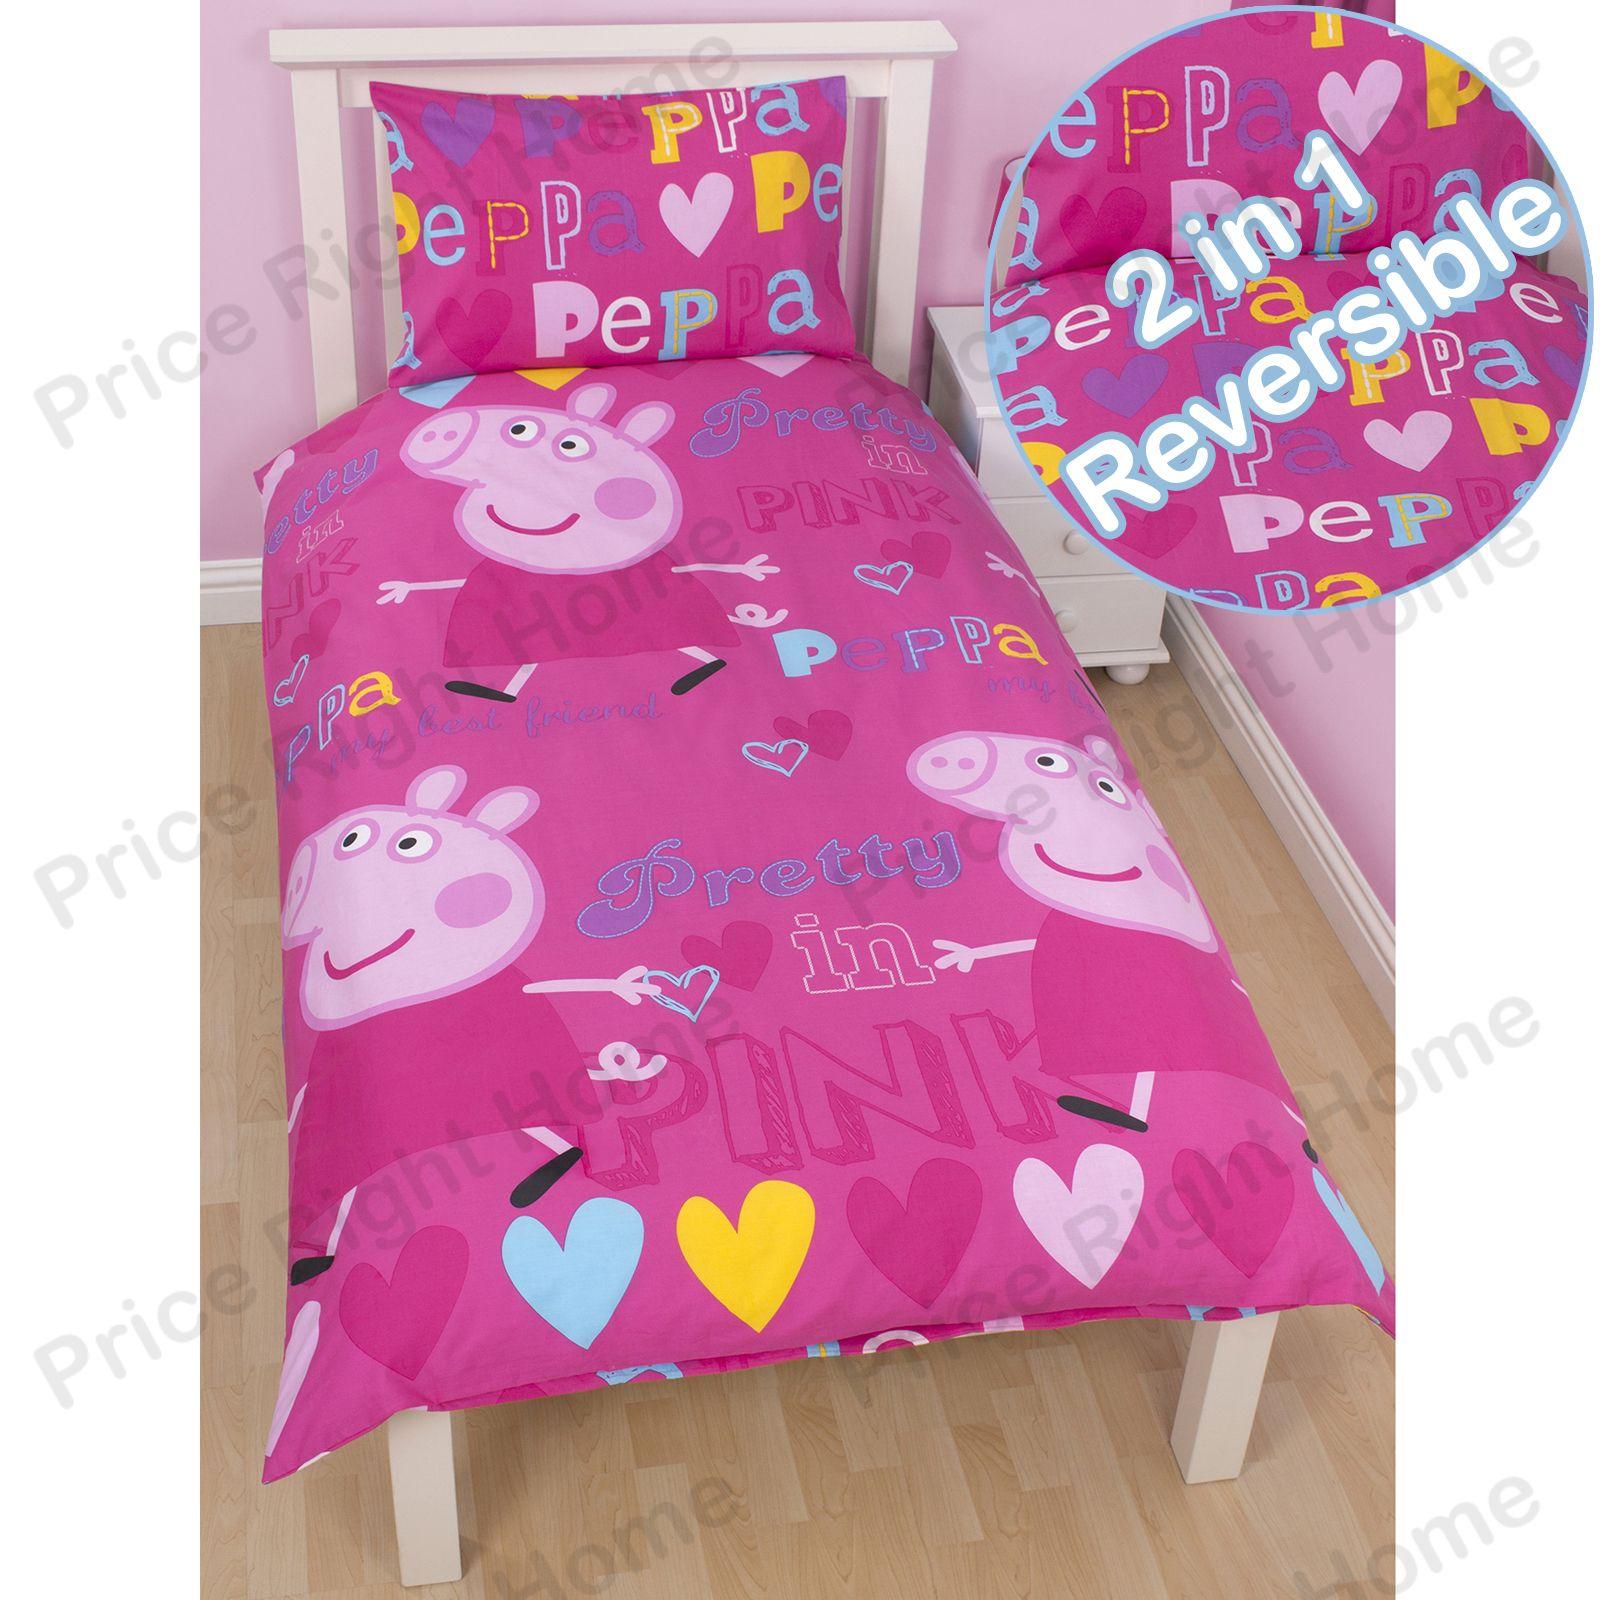 Peppa Pig Duvet Cover Sets Junior Single Double Brand New  # Muebles De Peppa Pig